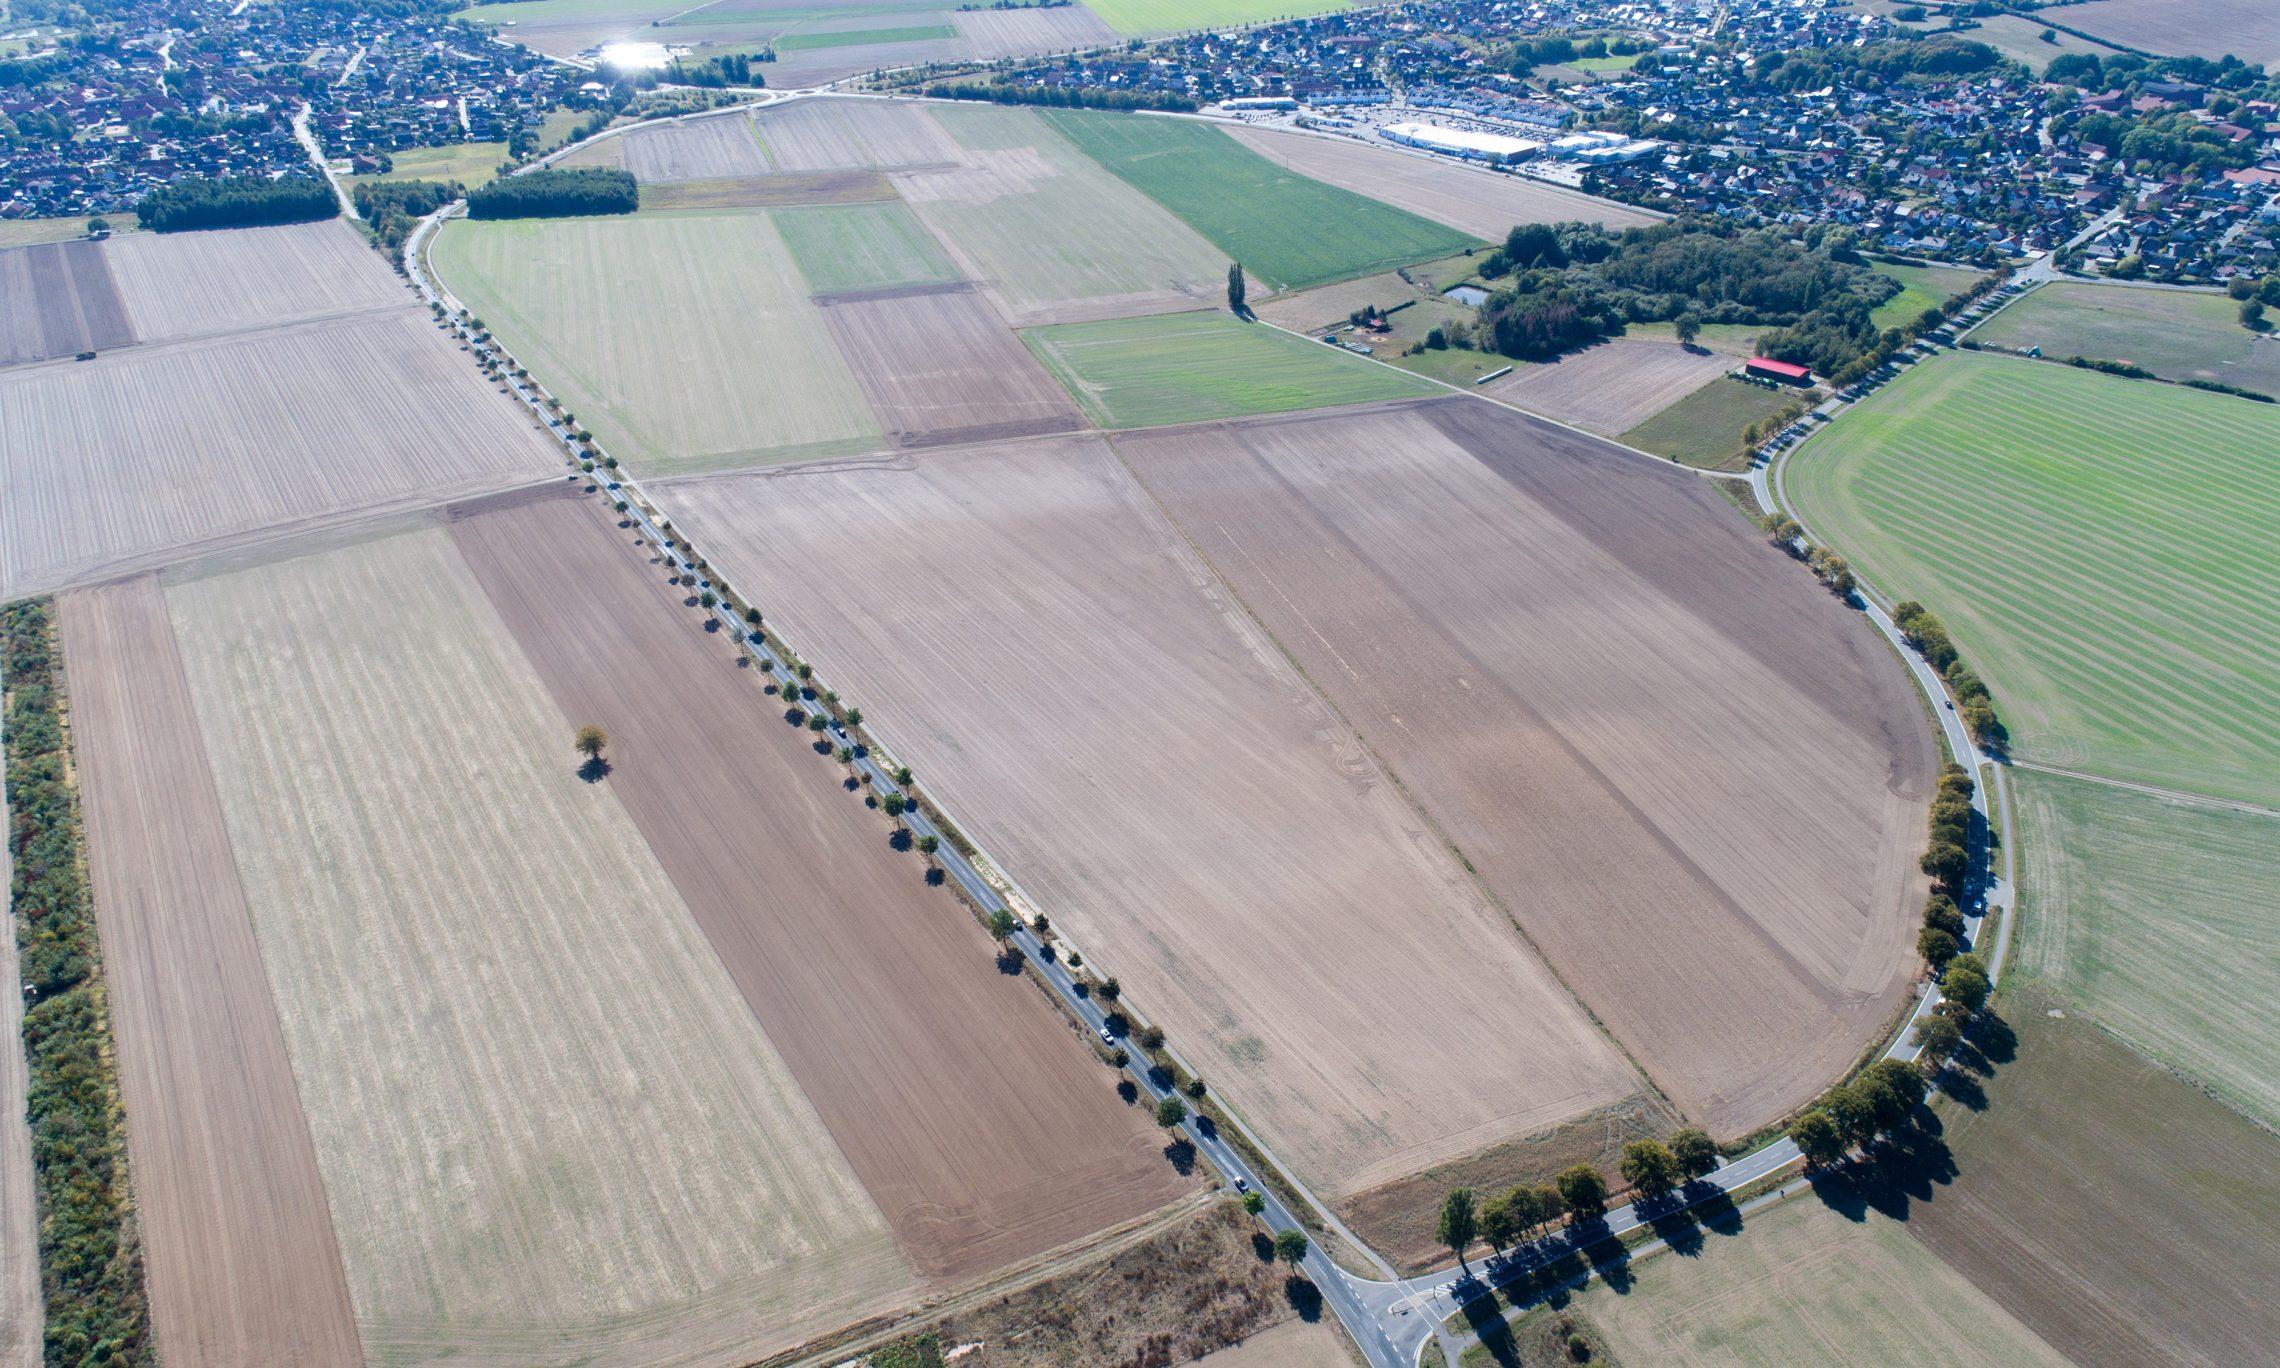 Sonnenkamp (Foto: Bauland Report)